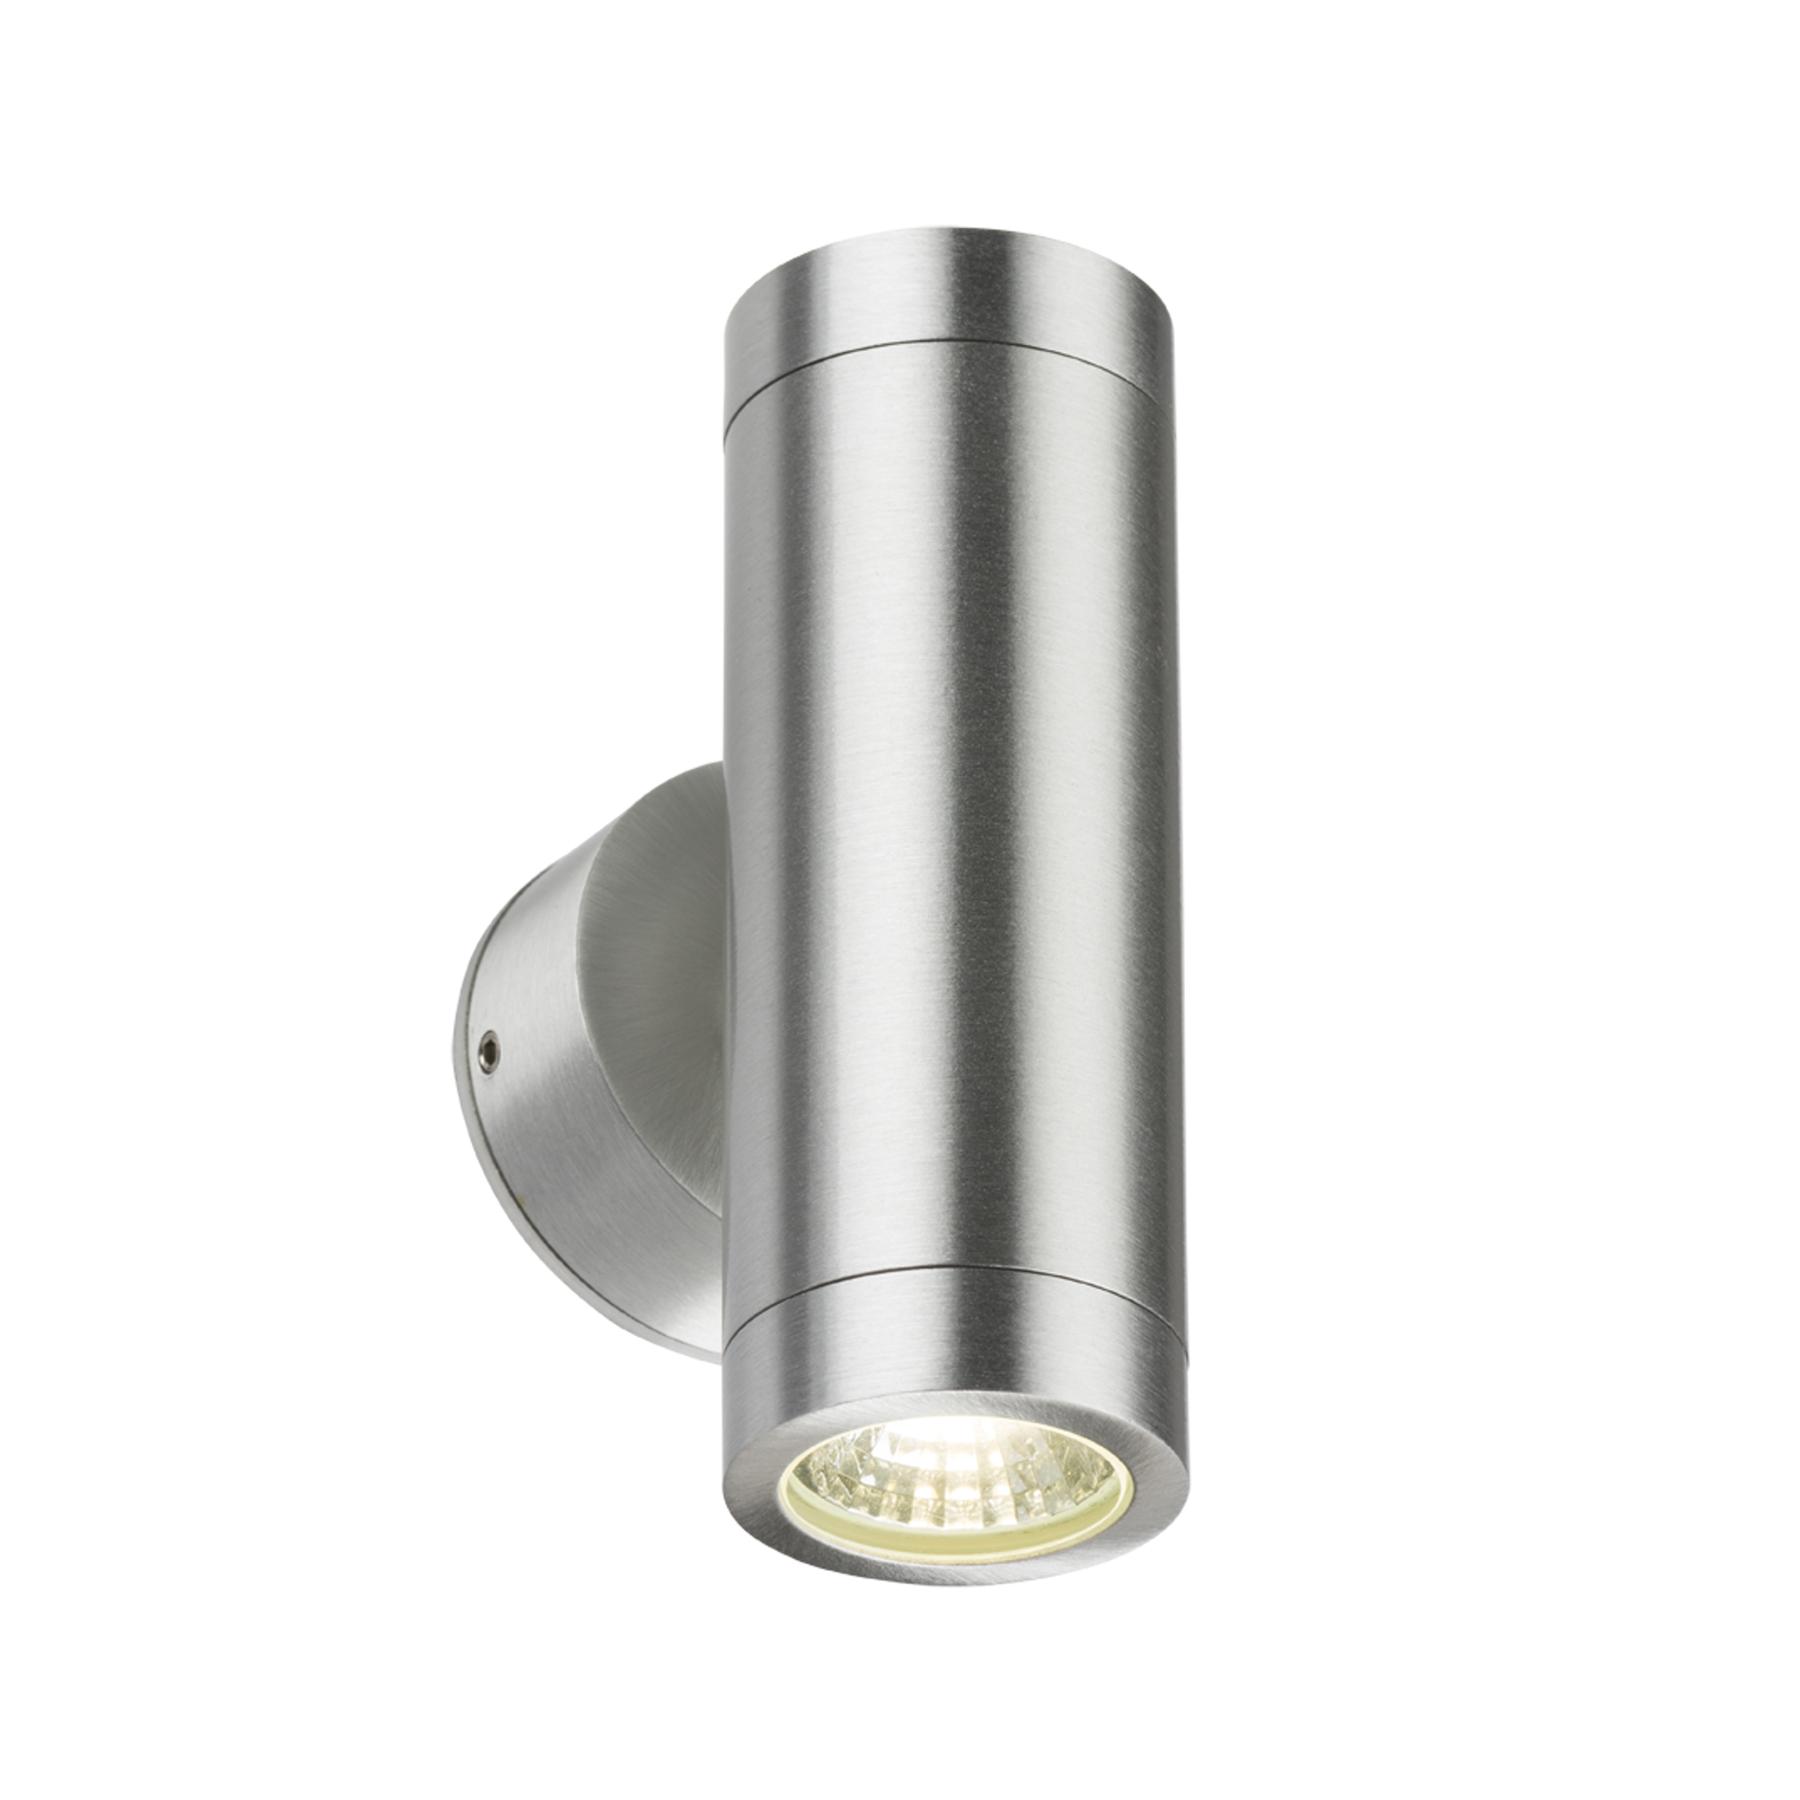 Led Wall Light Ip65: /Knightsbridge LWALL2 230V IP65 2 X 3W LED Up/Down Wall